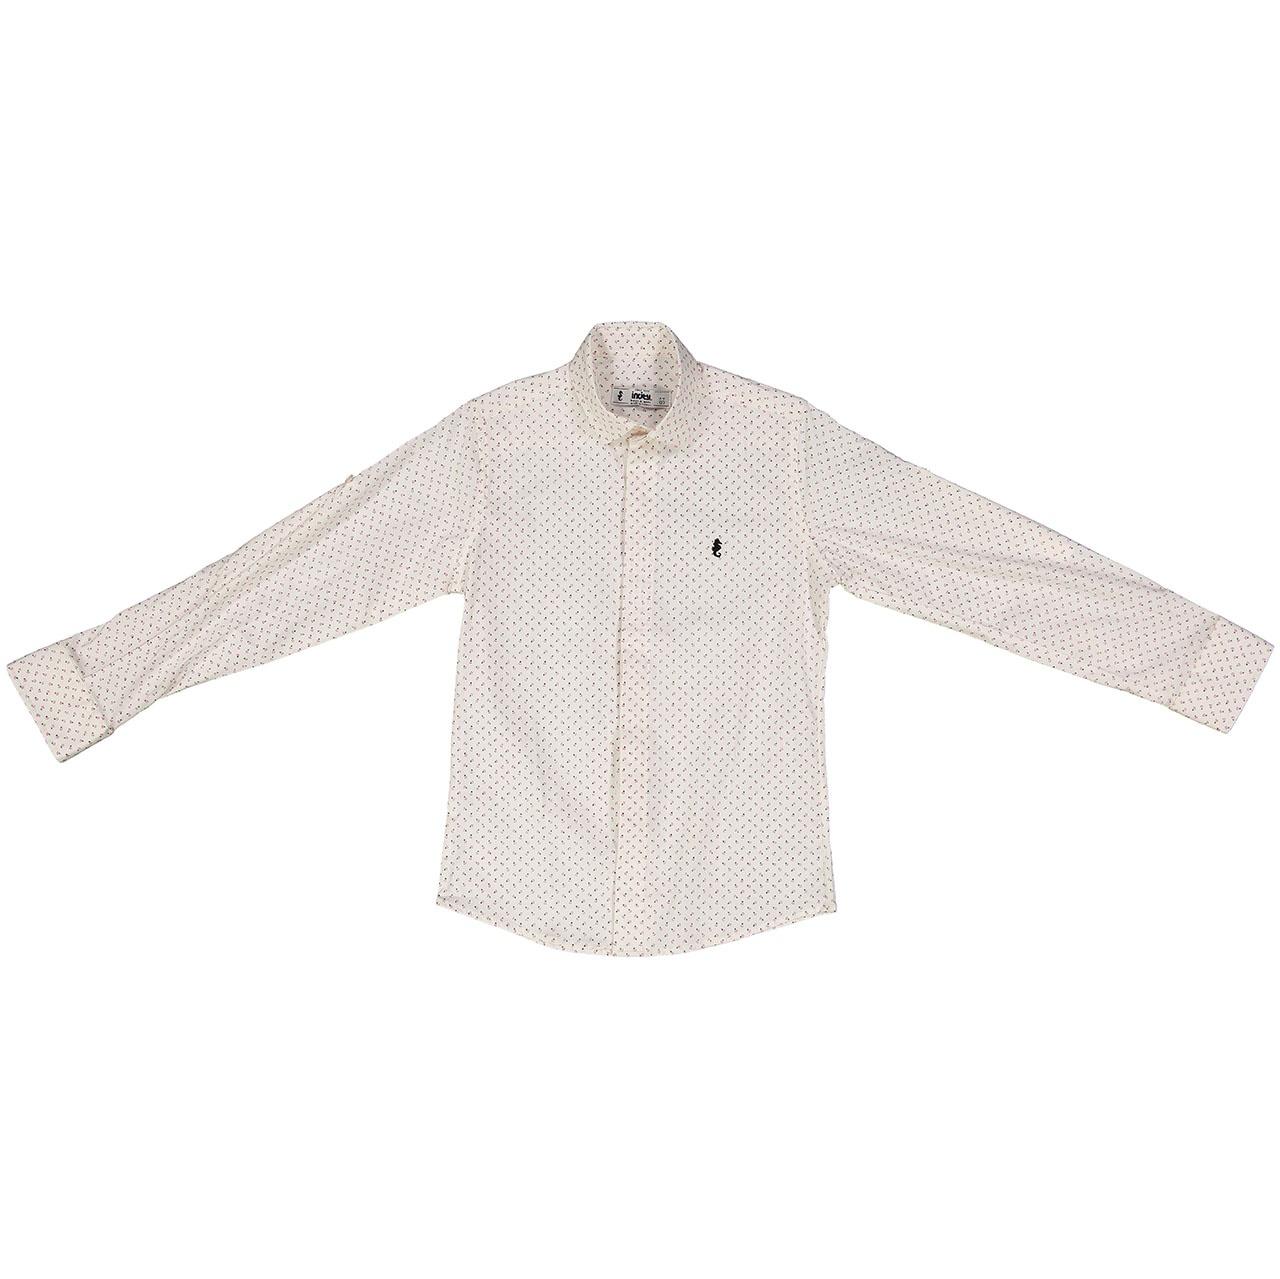 پیراهن بچه گانه اینسیتی کد 3537